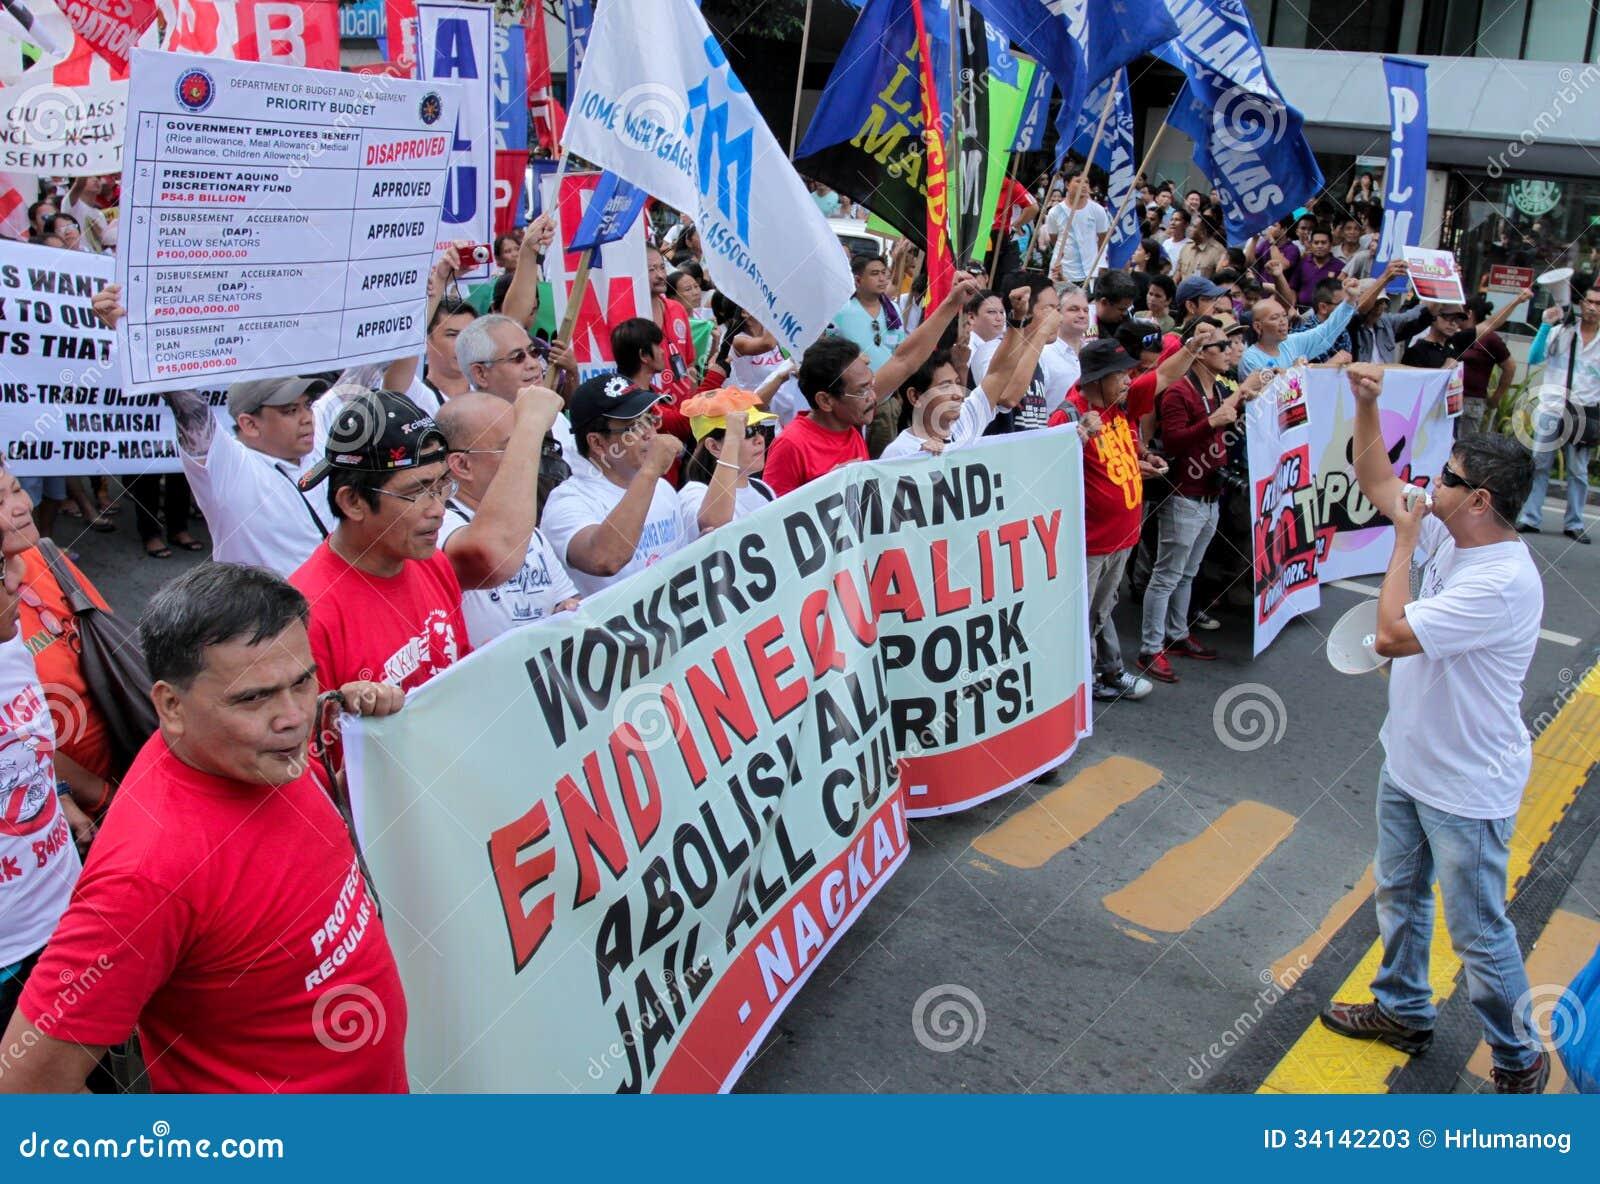 Graft and corruption protest in Manila, Philippines